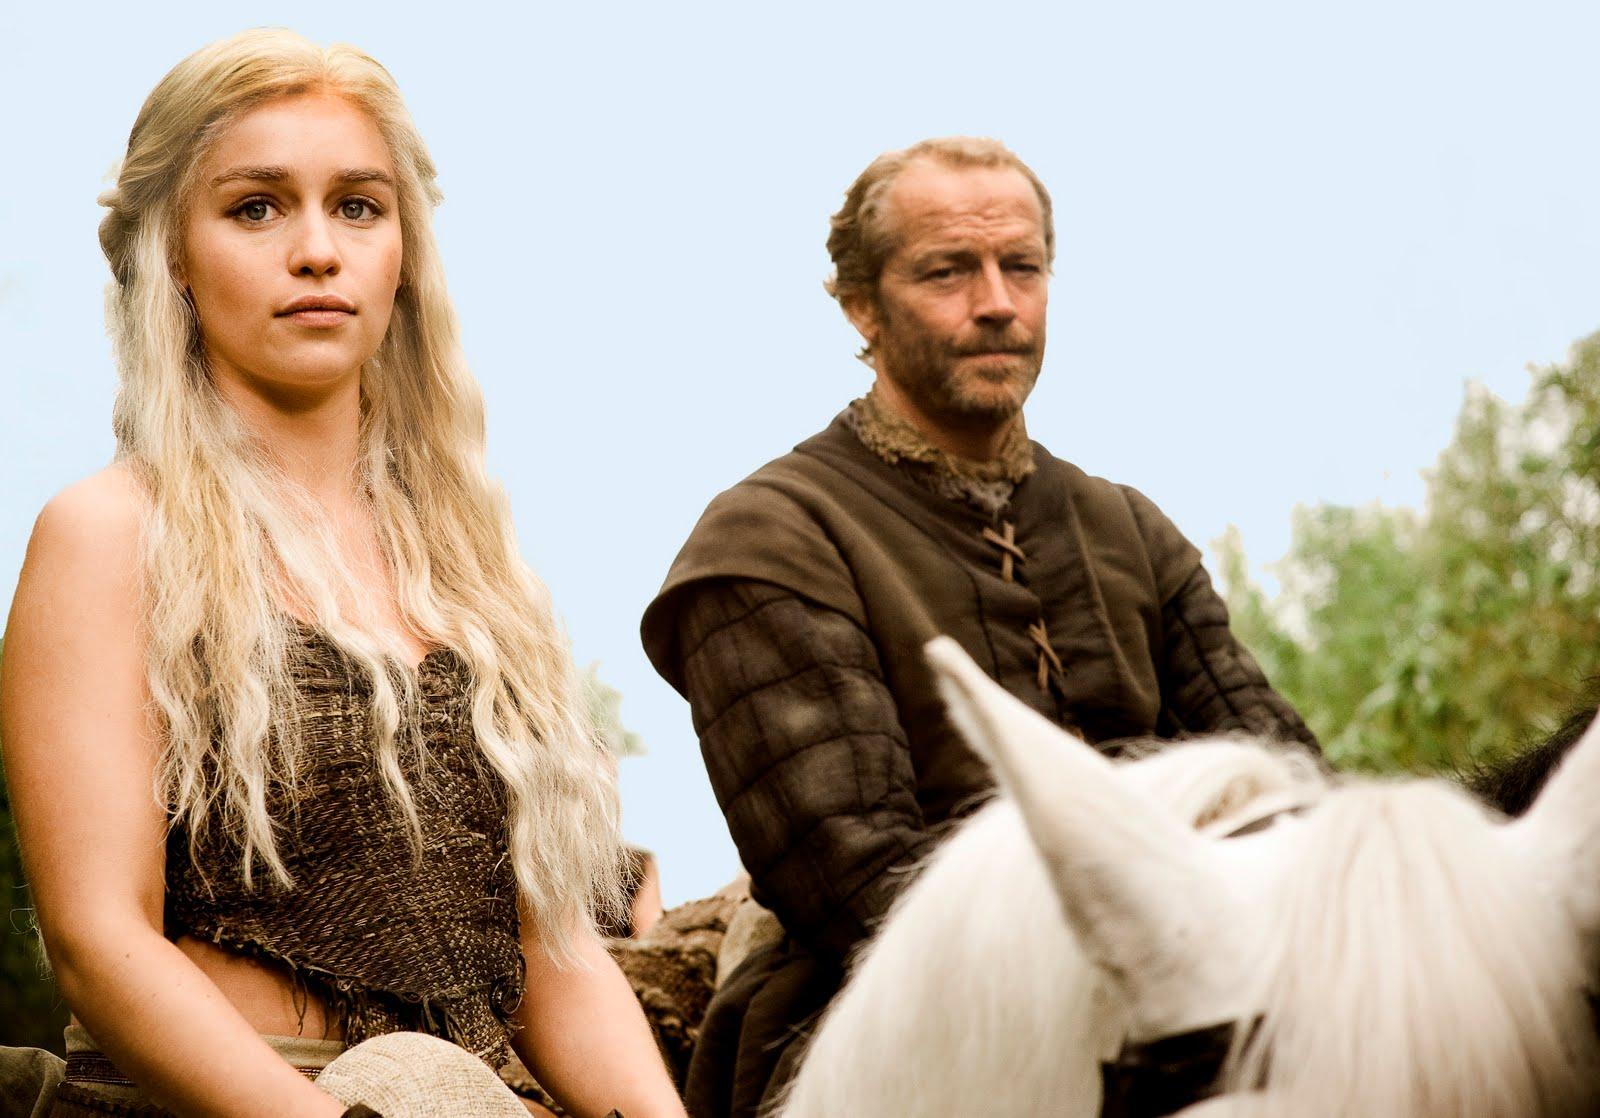 http://3.bp.blogspot.com/-ZvJREHk2fyw/TgYICimgJtI/AAAAAAAABnc/SBUAS1GFECc/s1600/Game+of+Thrones+Daenerys.jpg